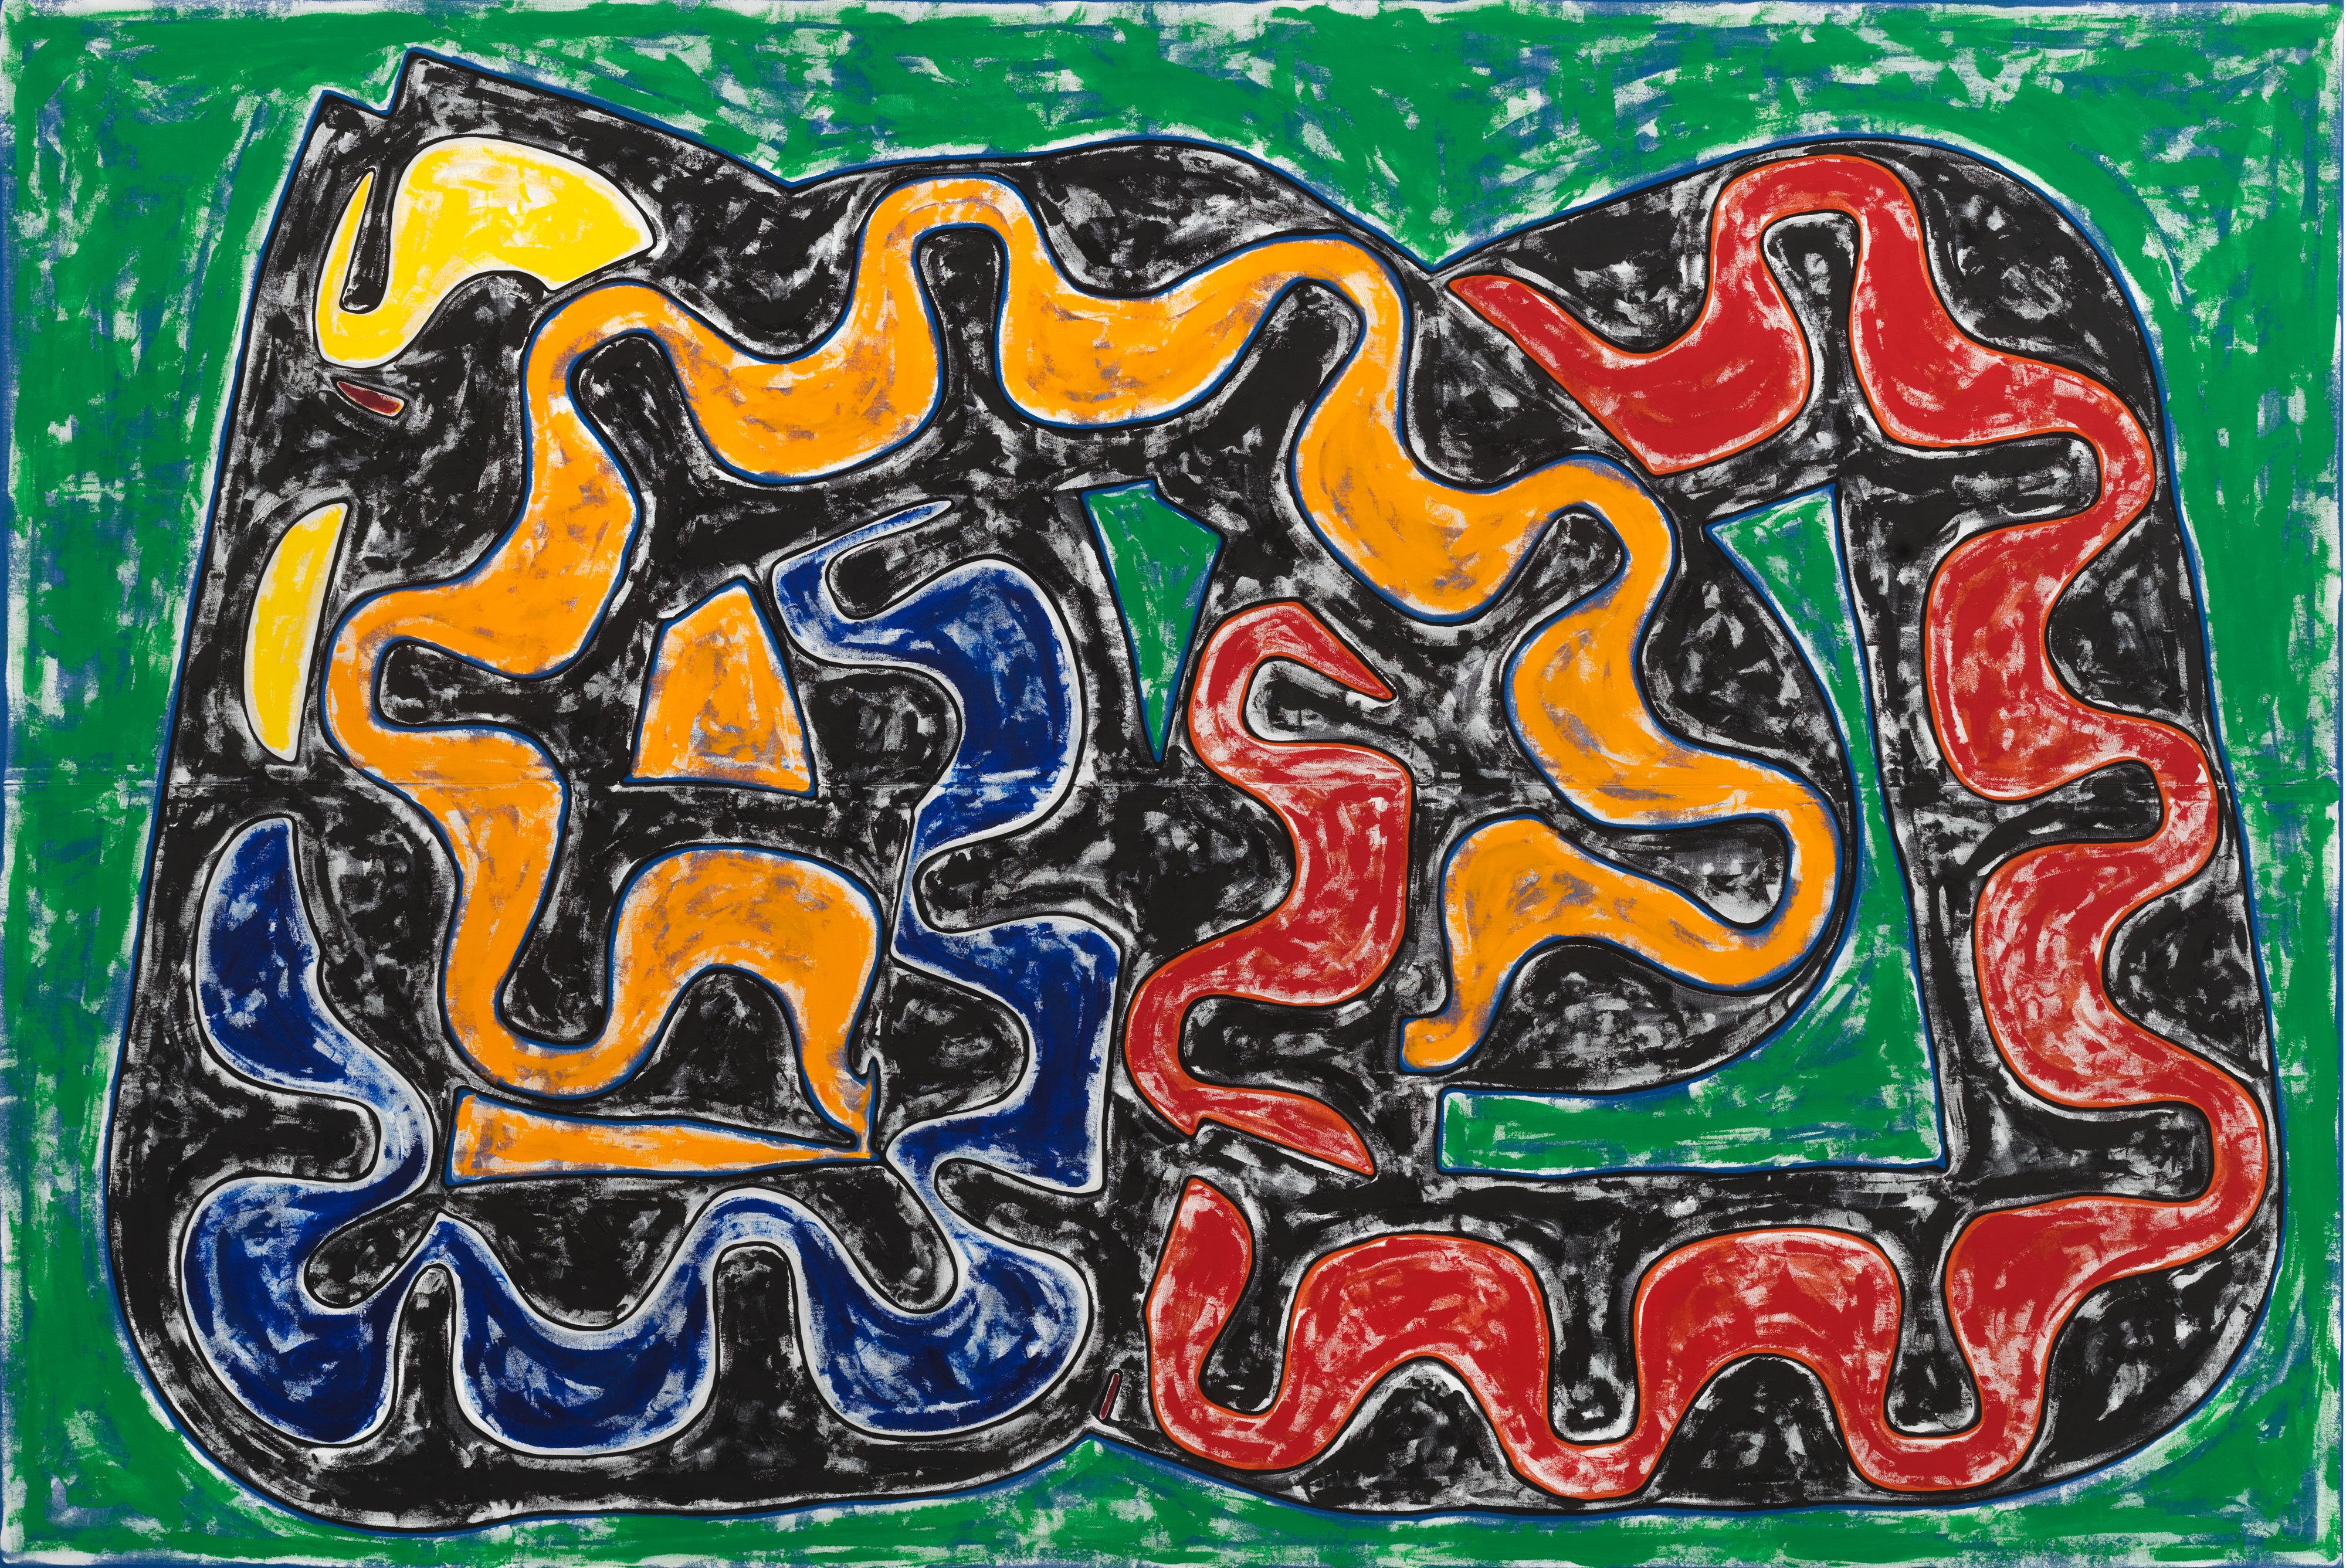 Galerie Barbara Thumm \ New Viewings #33 \ Diango Hernández